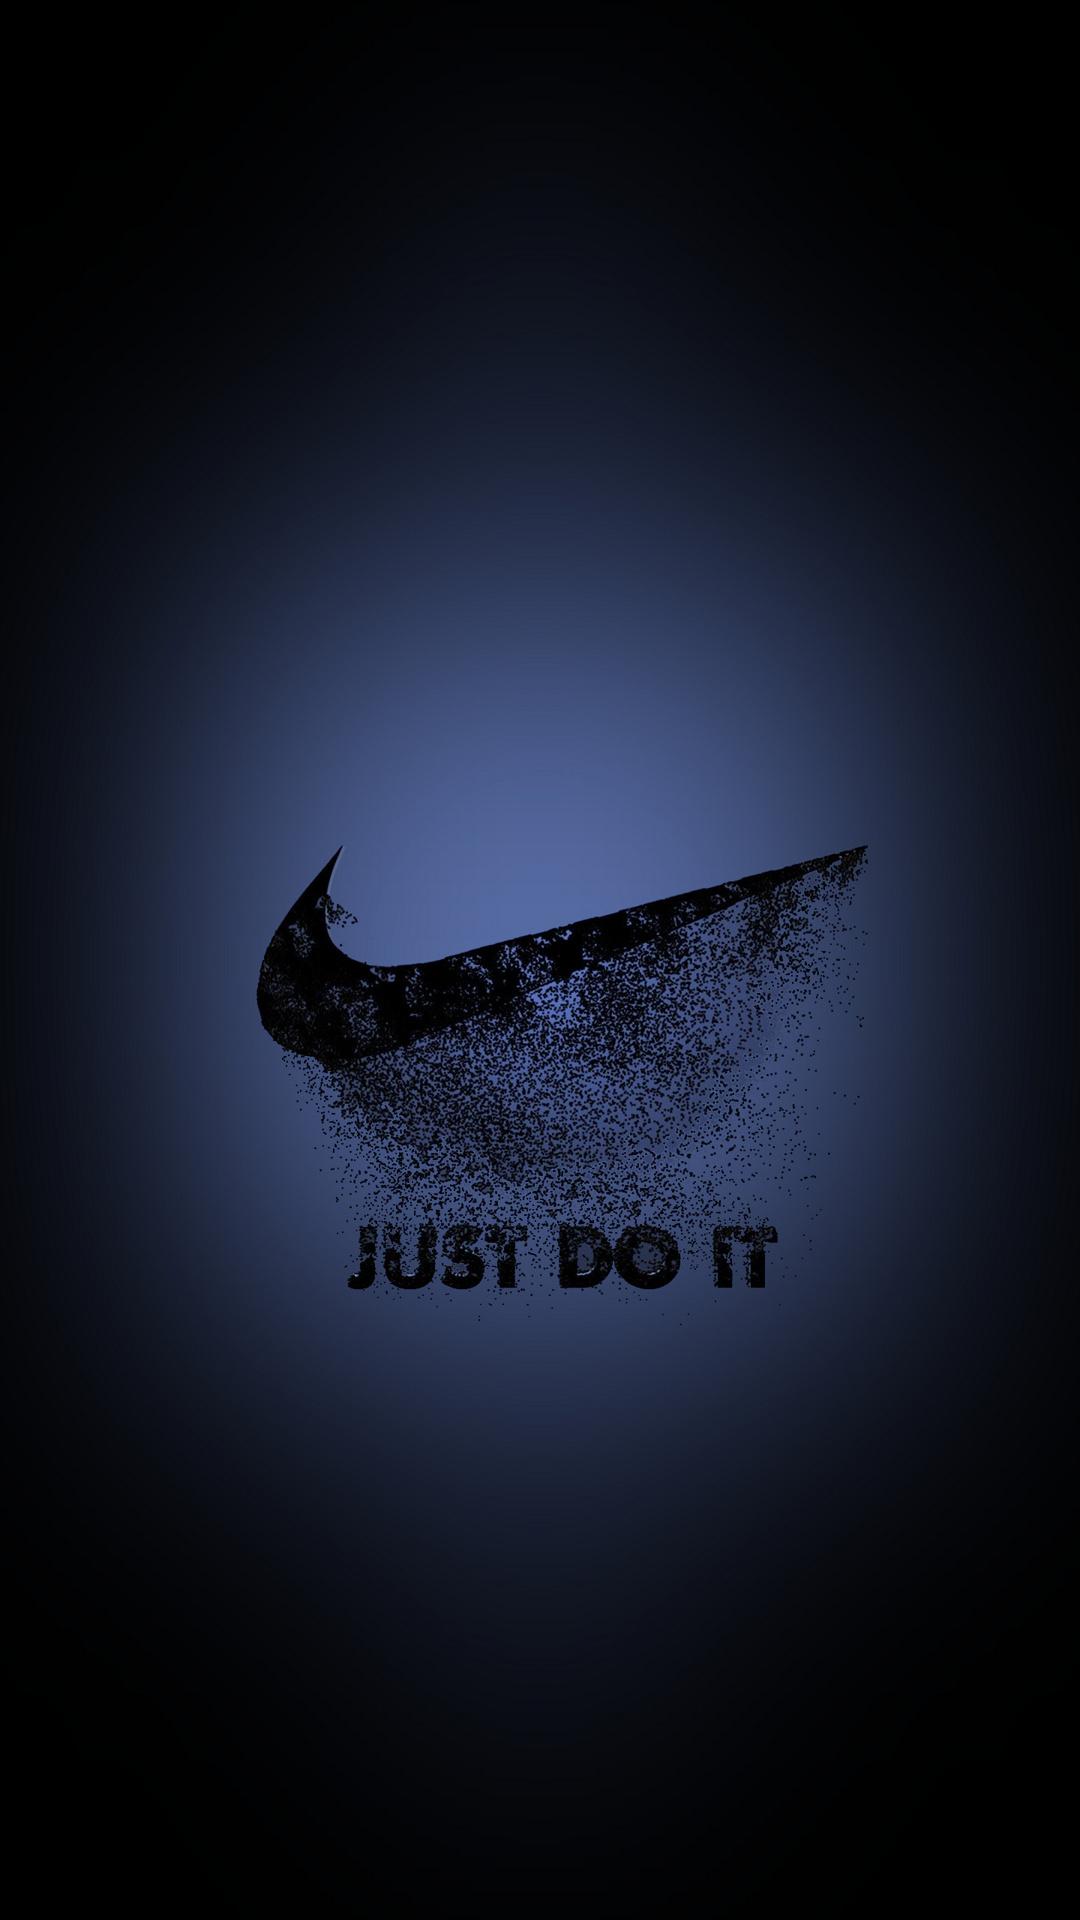 iPhone Wallpaper Nike Brands